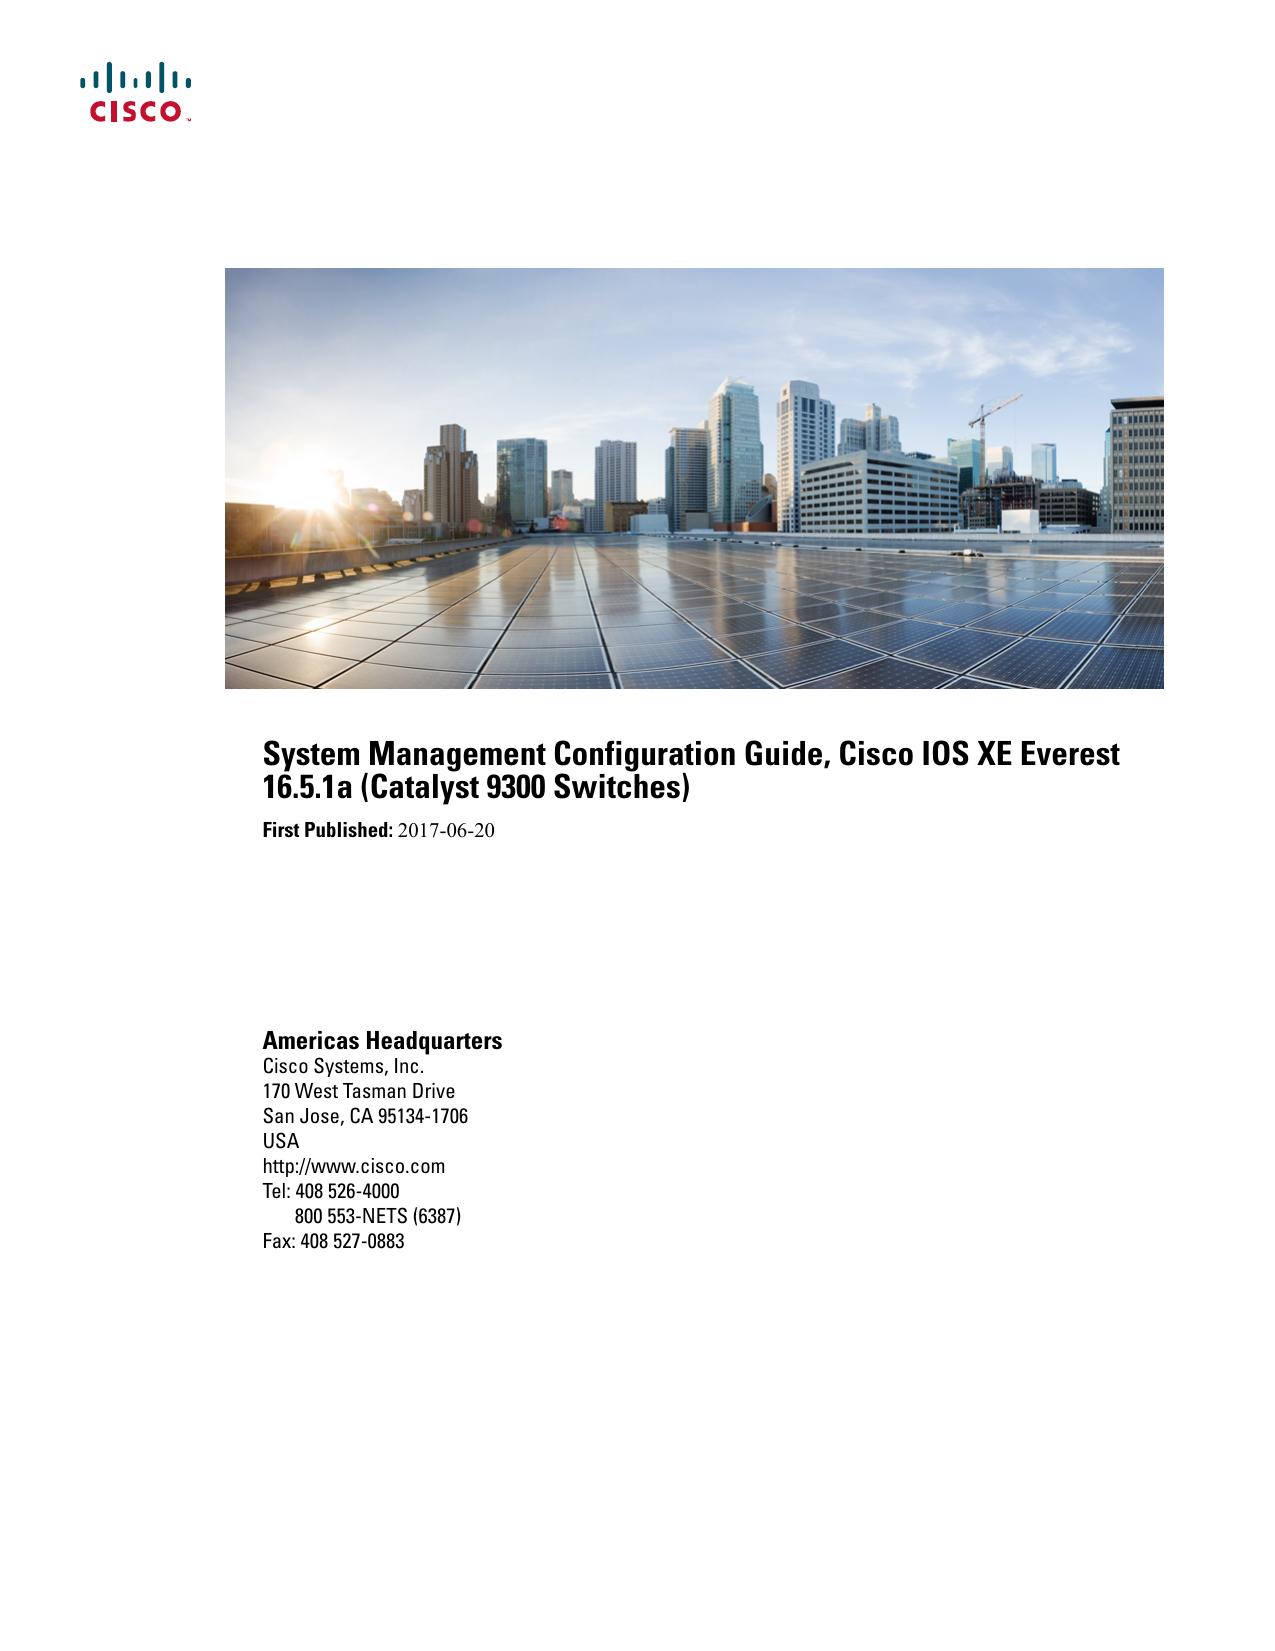 System Management Configuration Guide, Cisco IOS XE Everest